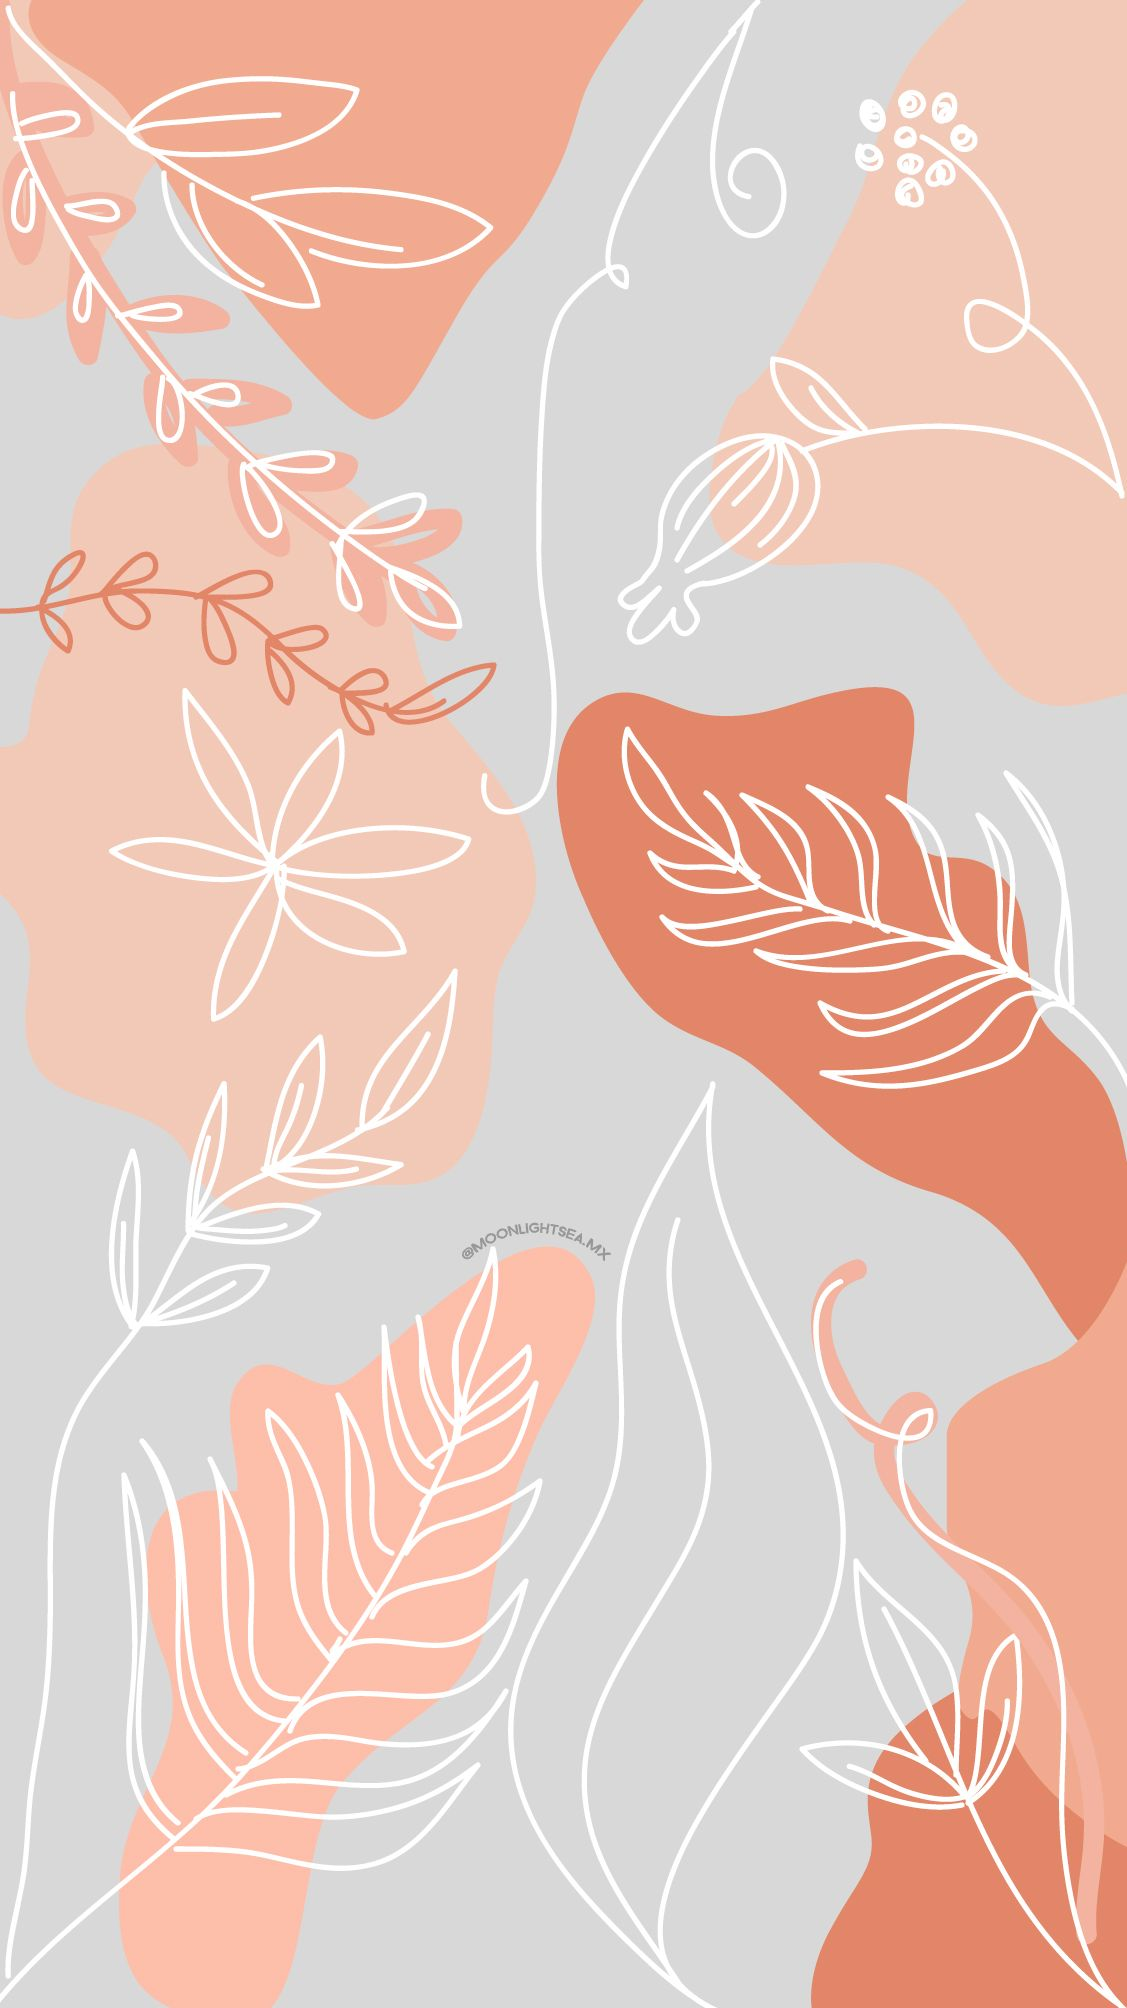 W A L L P A P E R In 2021 Iphone Wallpaper Pattern Abstract Wallpaper Phone Wallpaper Patterns